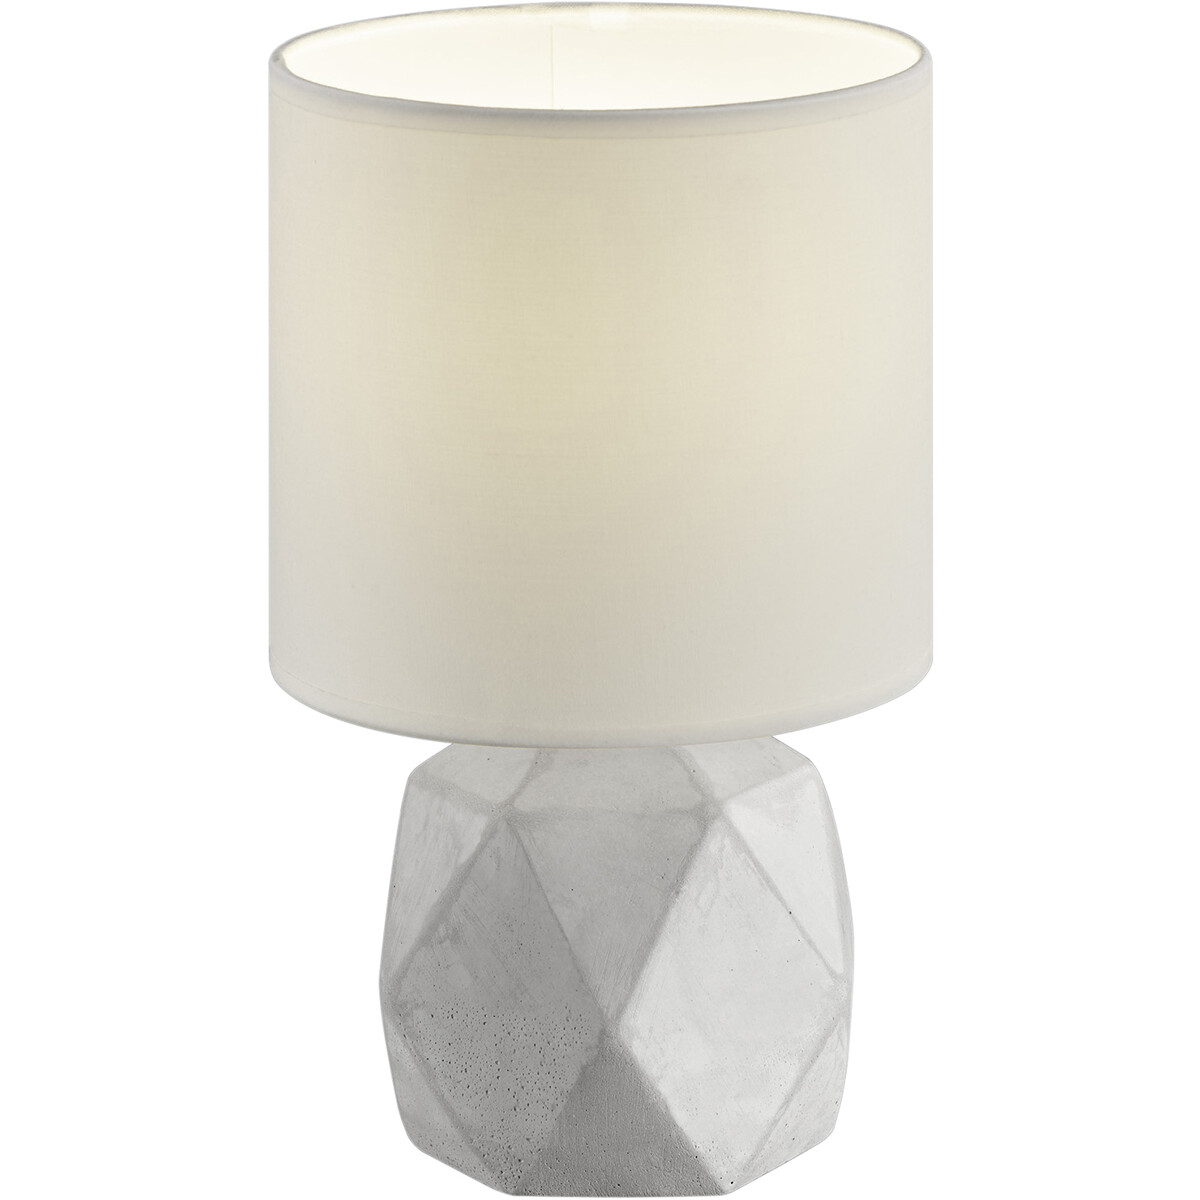 LED Tafellamp - Tafelverlichting - Trion Pikanto - E14 Fitting - Rond - Mat Wit - Beton